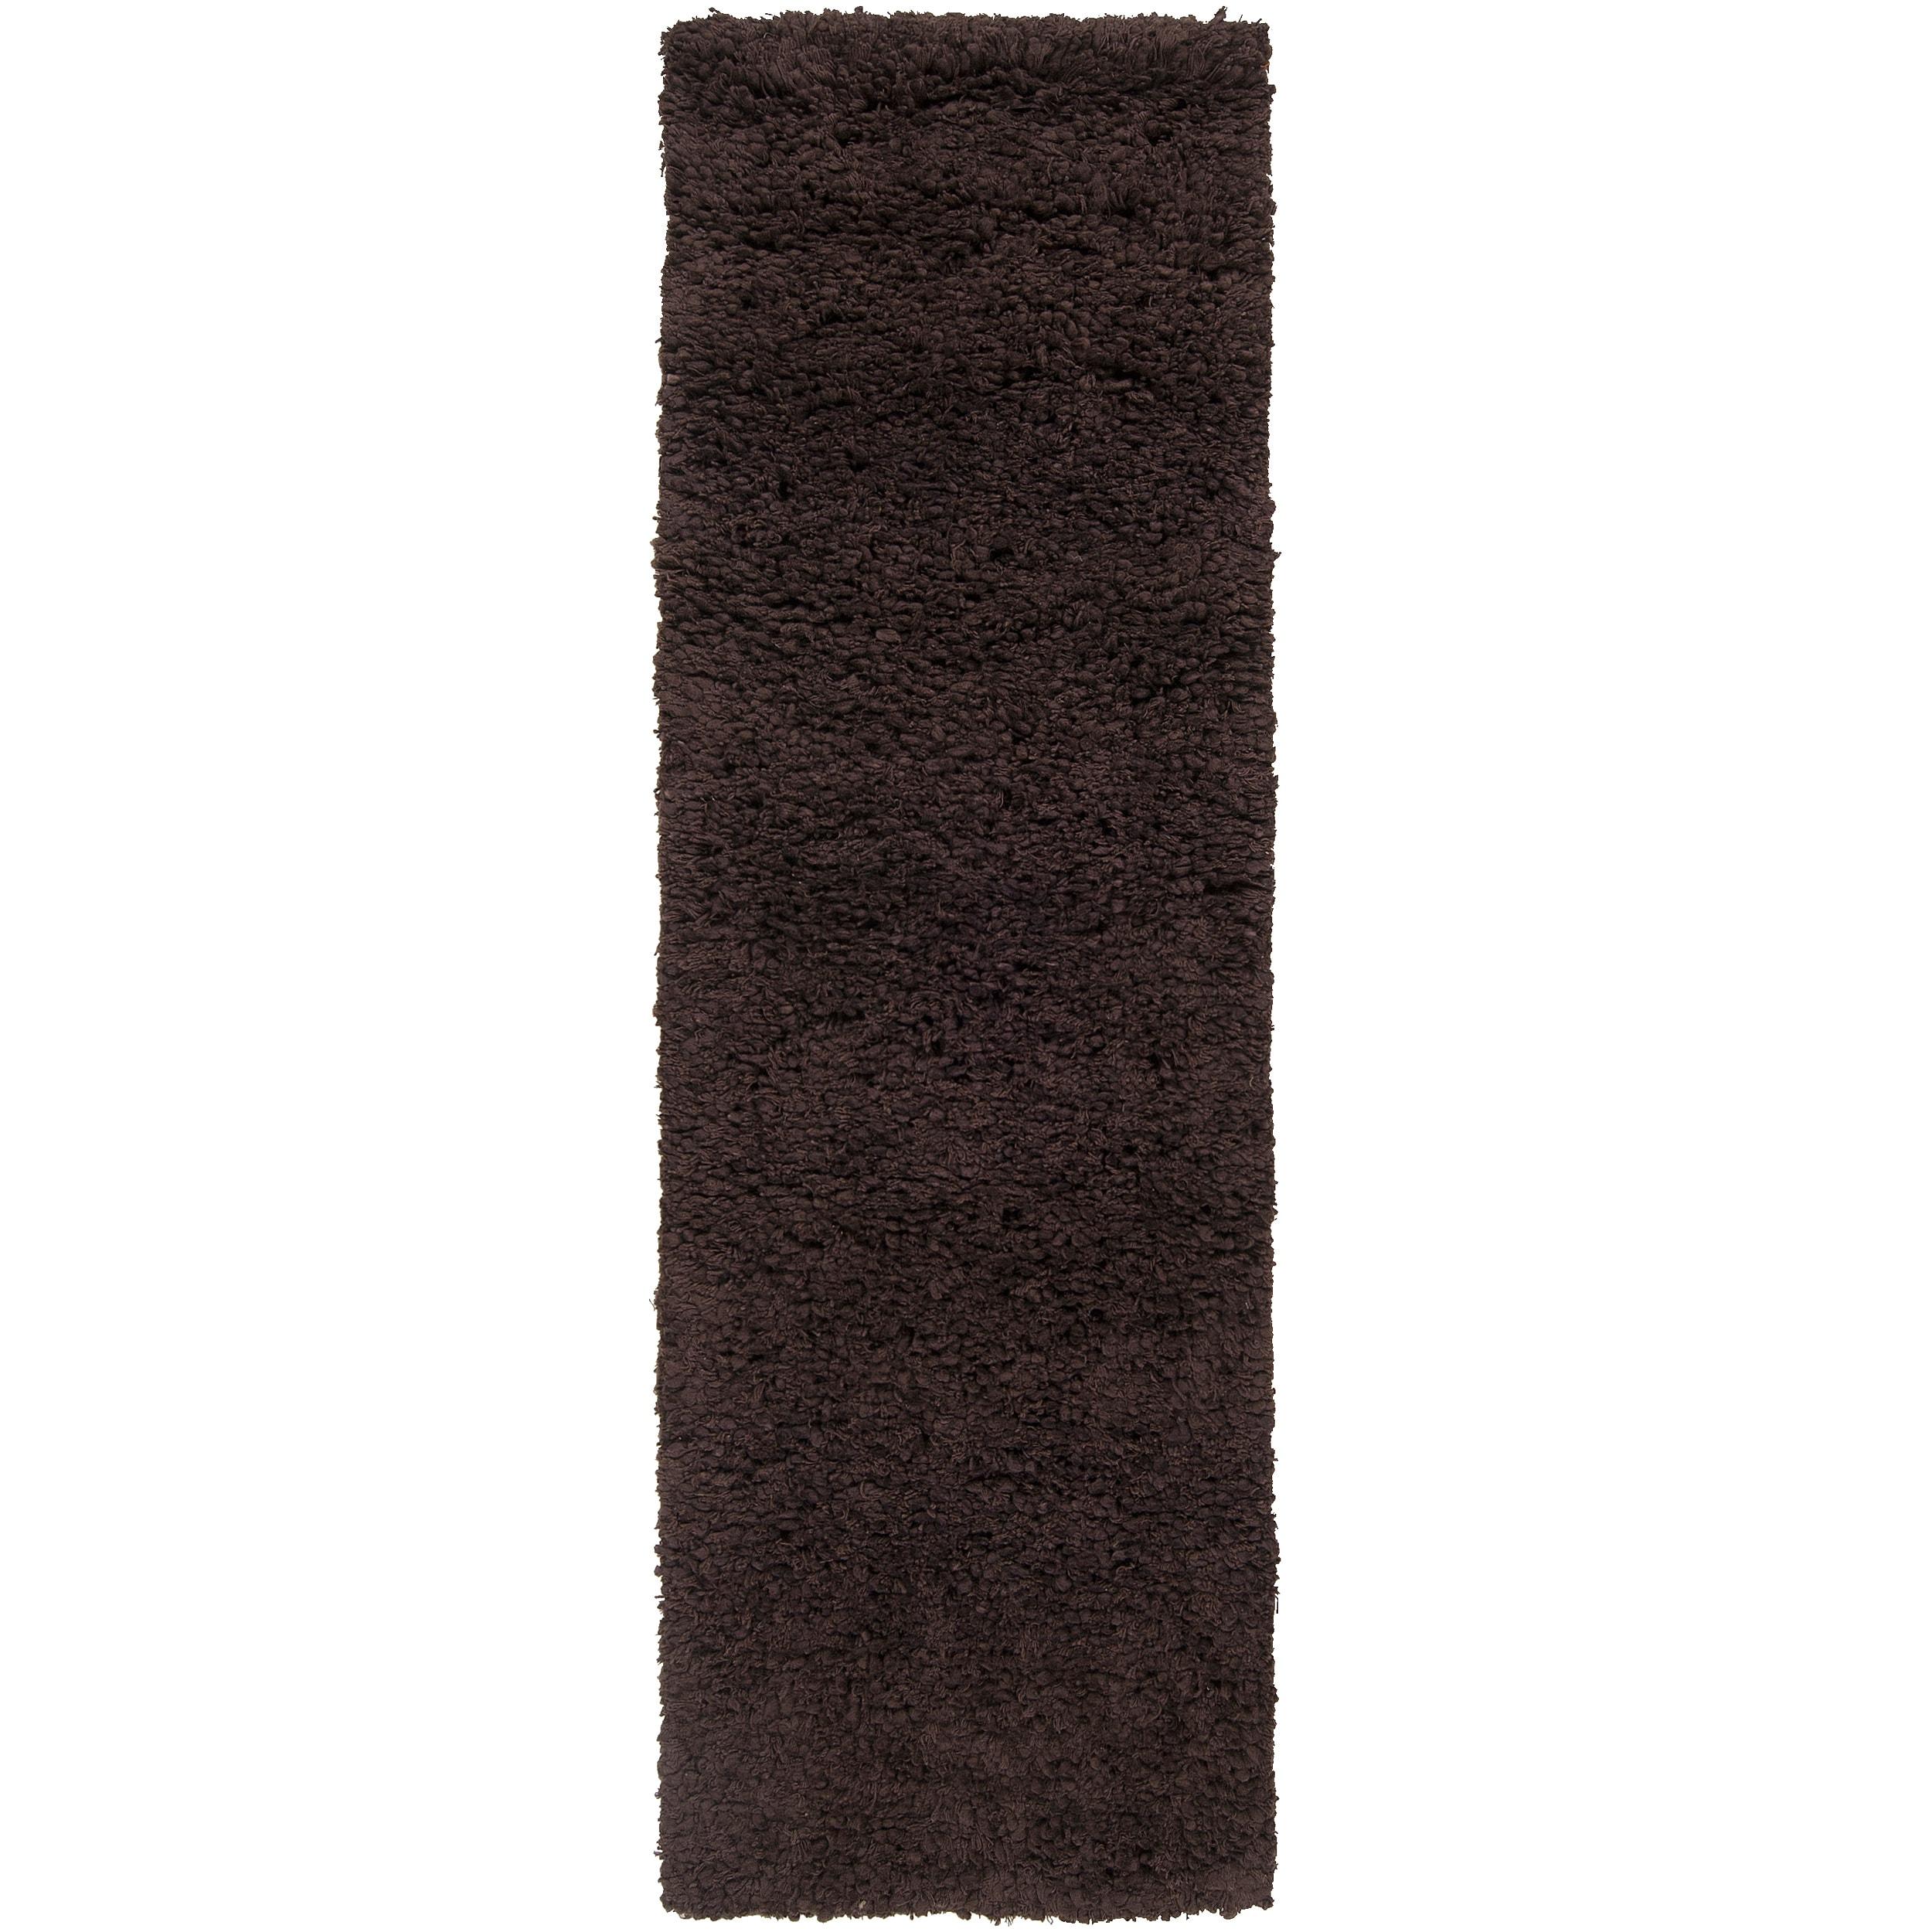 Hand-woven Metropoli Black New Zealand Wool Plush Shag Area Rug - 2'6 x 8'